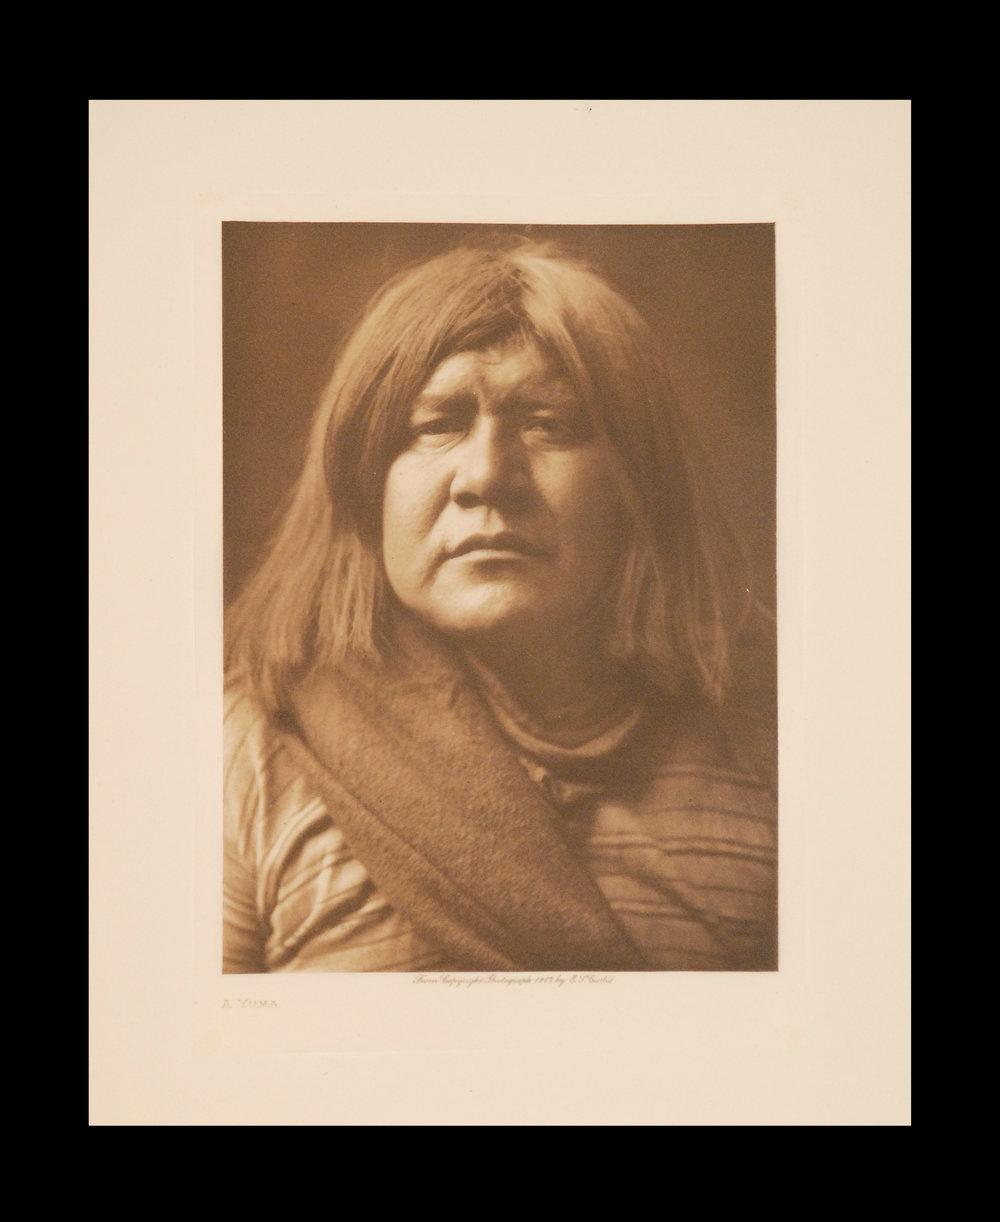 """A Yuma"" 1907 Vol.2 Tissue Print        Vintage Photogravure"